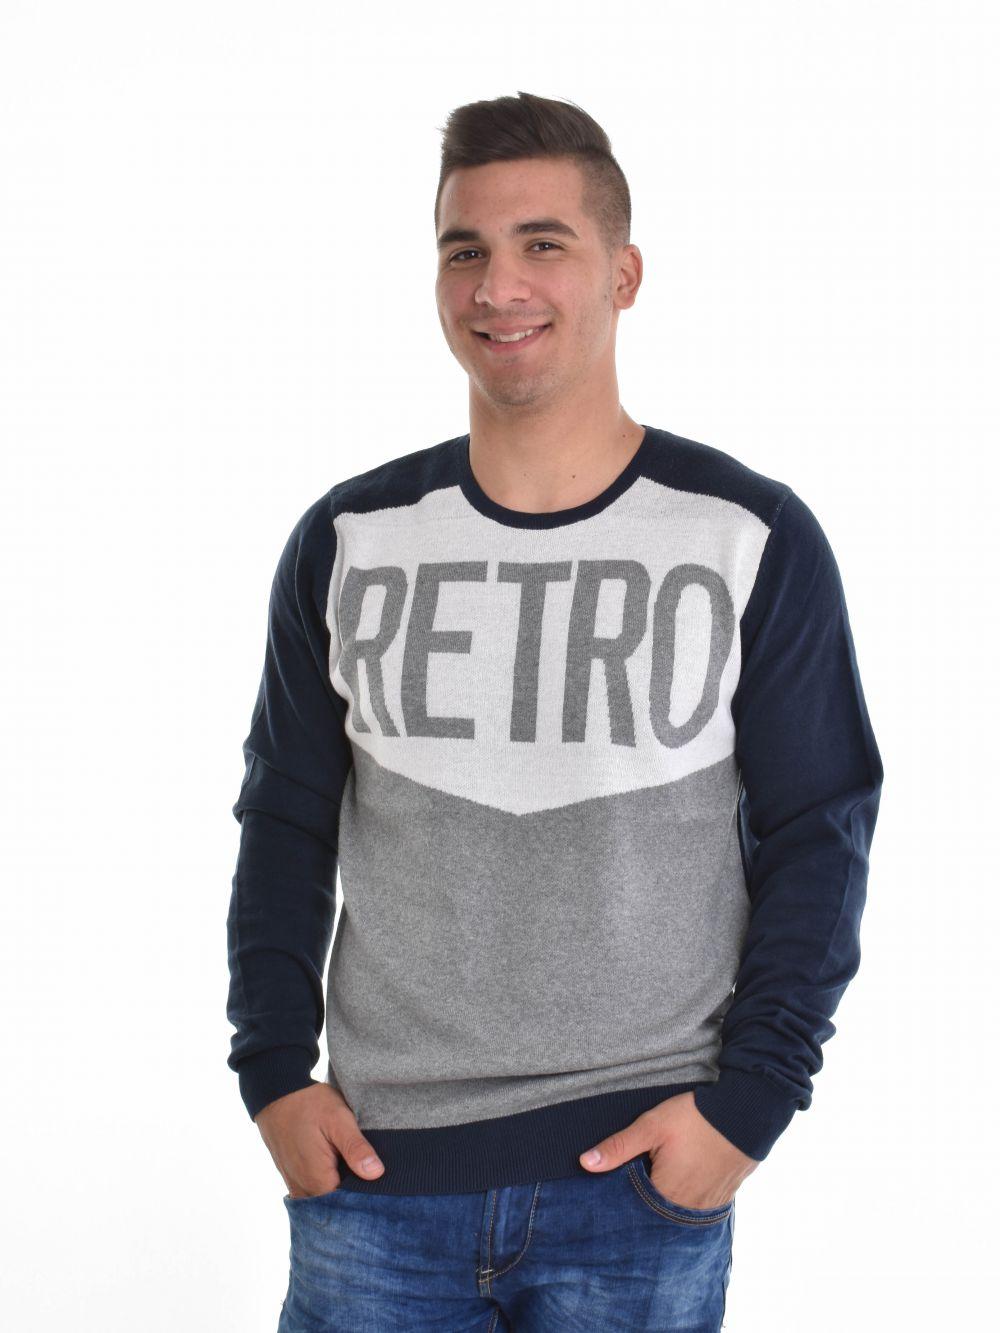 ac130f5753 Retro Jeans férfi pulóver JOG KNITWEAR | Markasbolt.hu Hivatalos ...